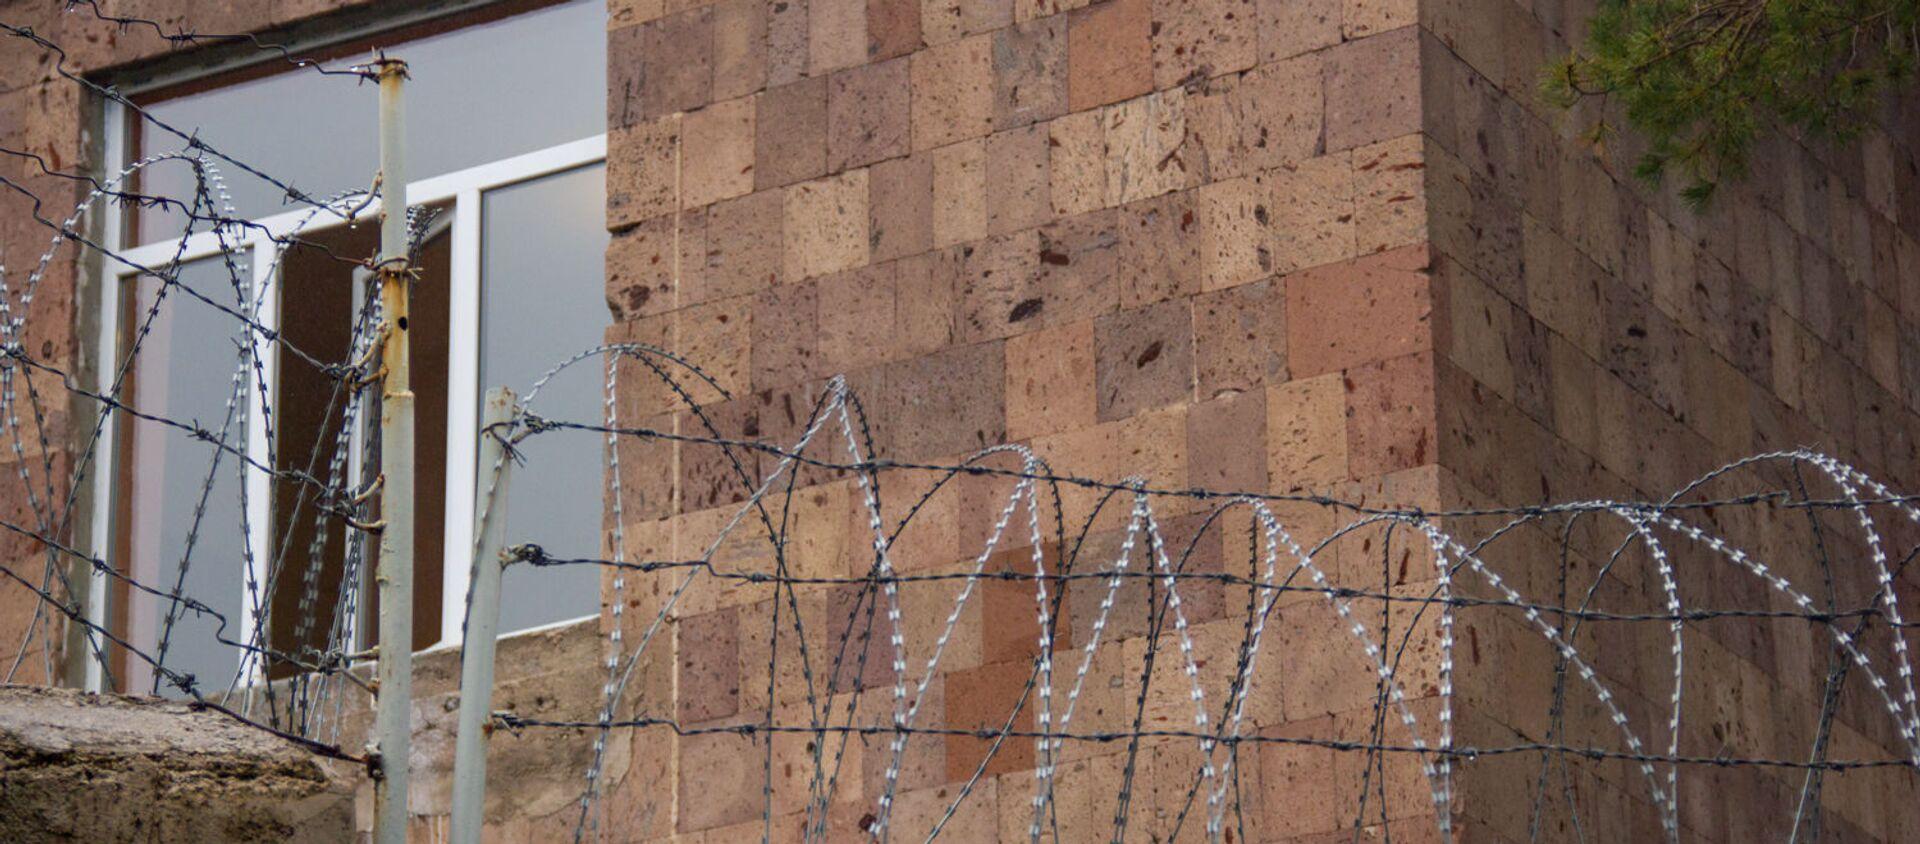 Женская тюрьма - Sputnik Արմենիա, 1920, 11.07.2021